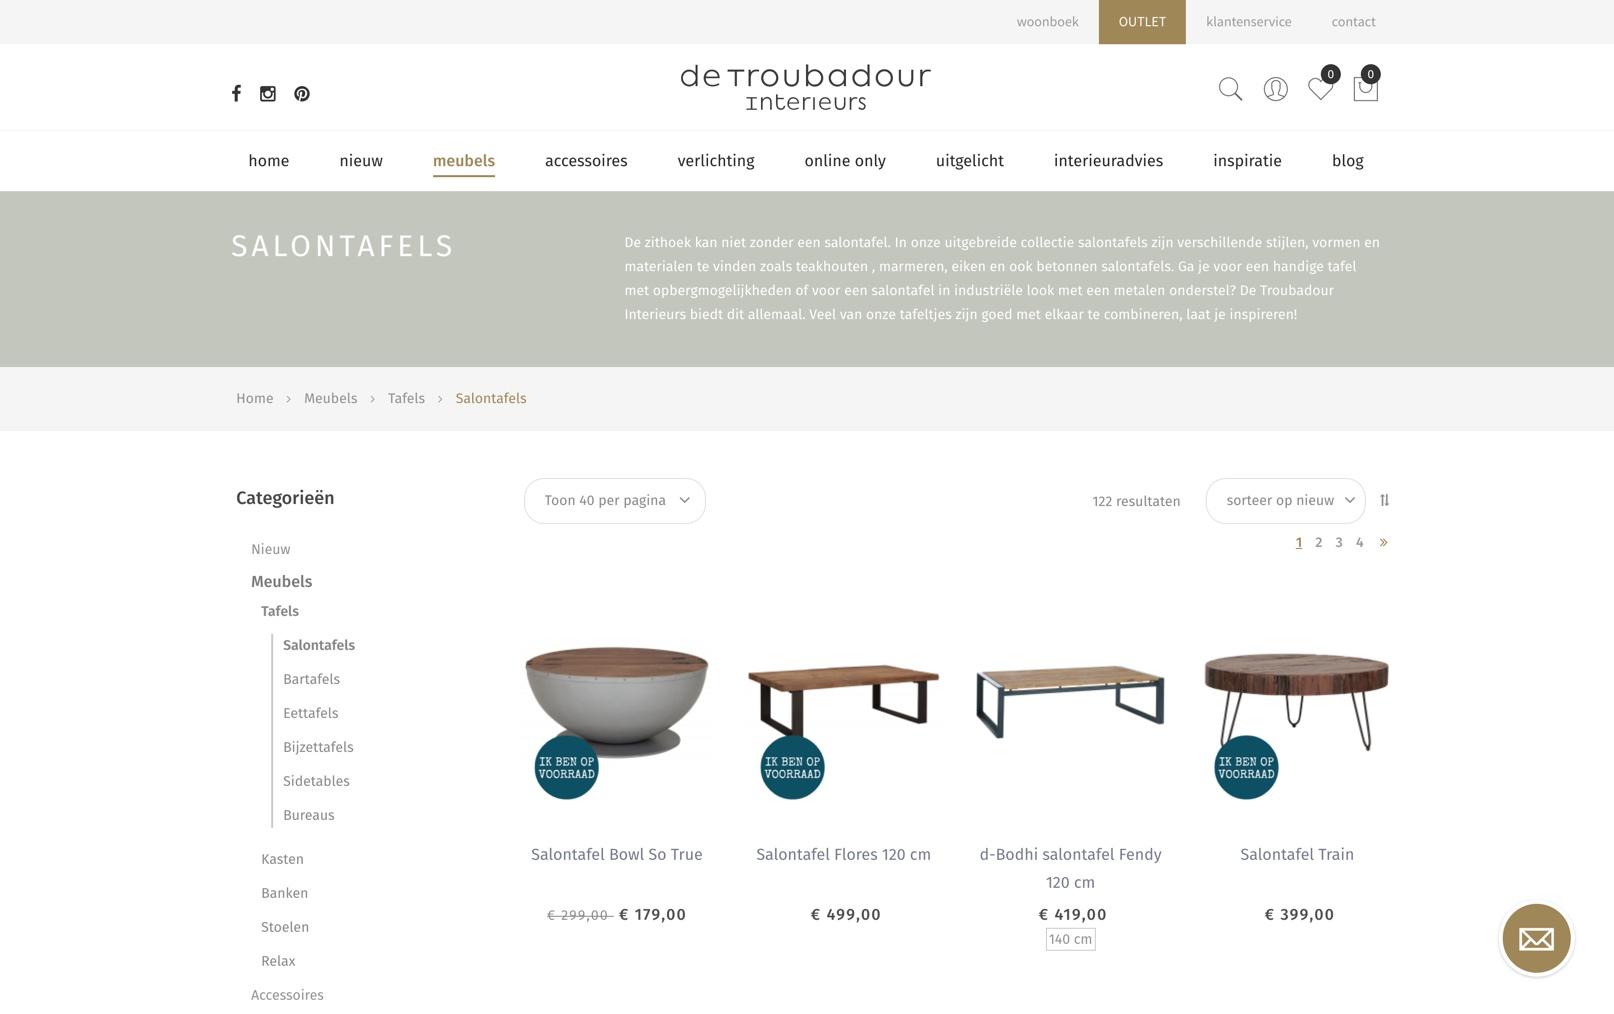 detroubadour-website2